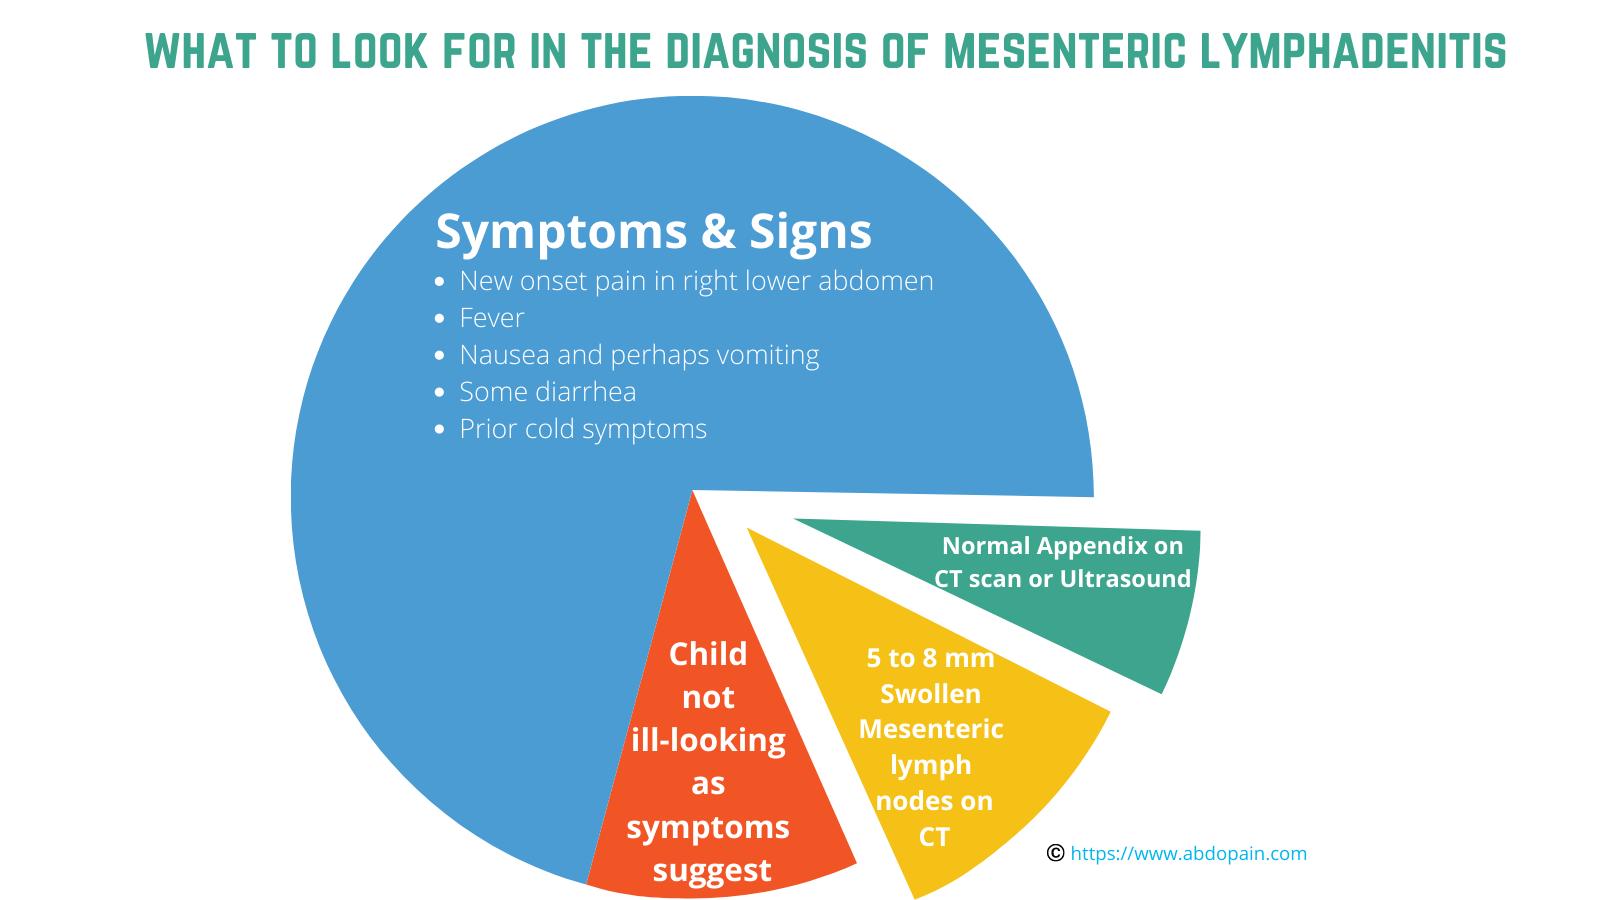 How is mesenteric lymphadenitis diagnosed?